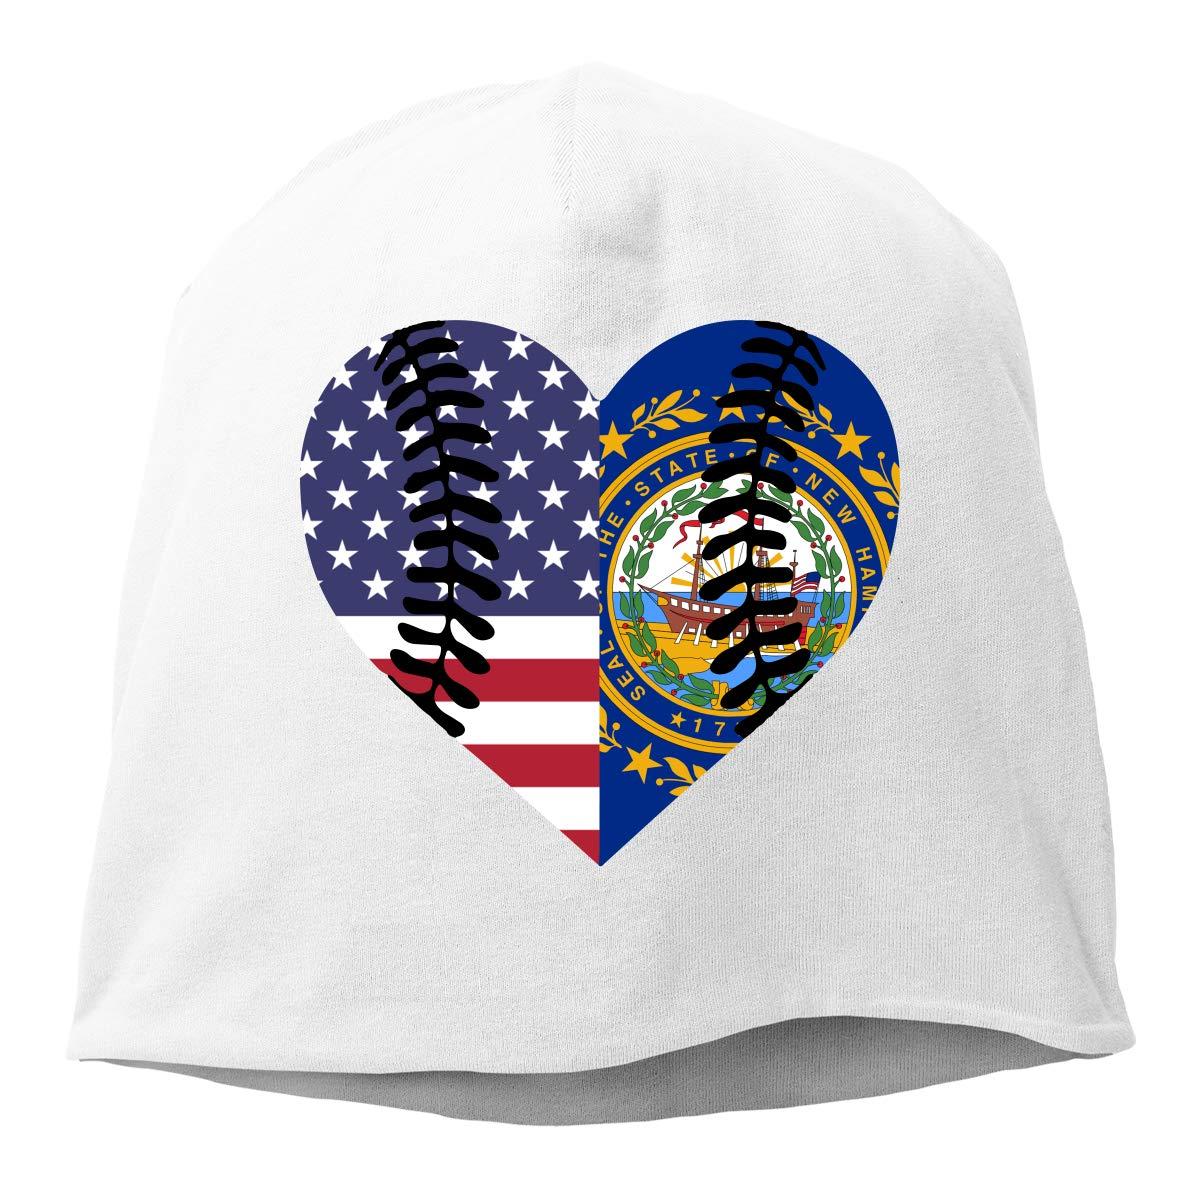 TLPM9LKMBM New Hampshire USA Flag Half Baseball Beanie Skull Cap for Women and Men Winter Warm Knit Hat